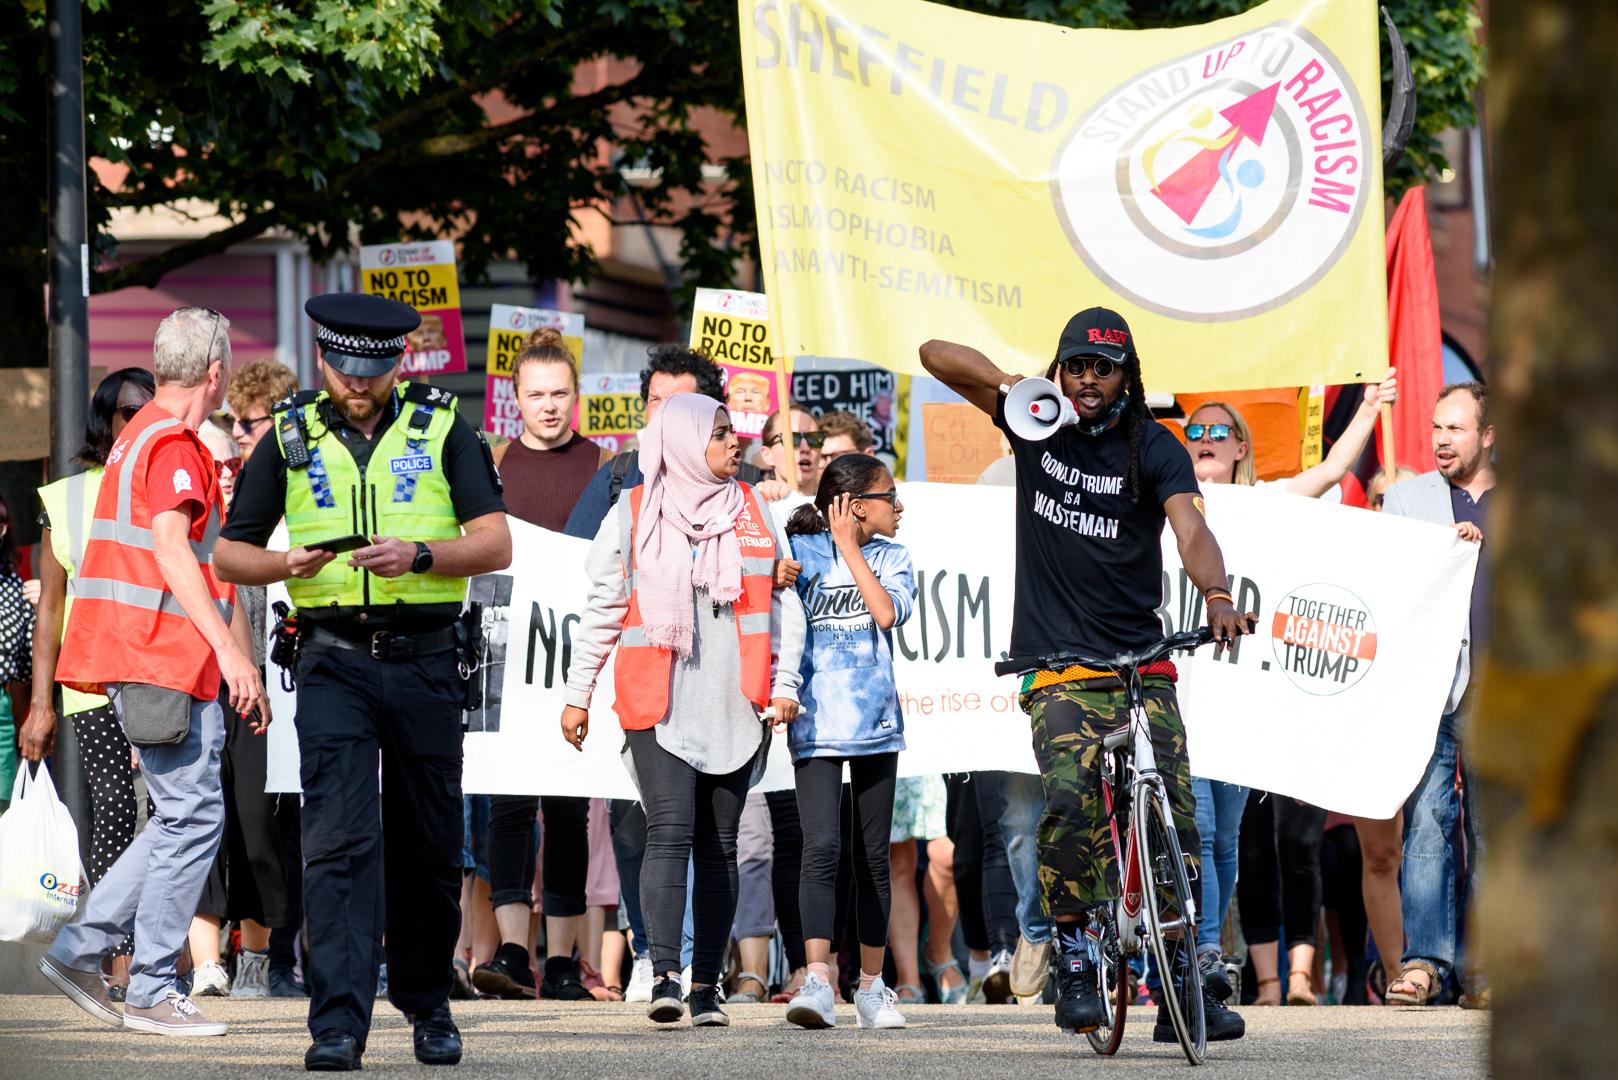 Sheffield Anti-Trump rally July 2018 Blog28.jpg